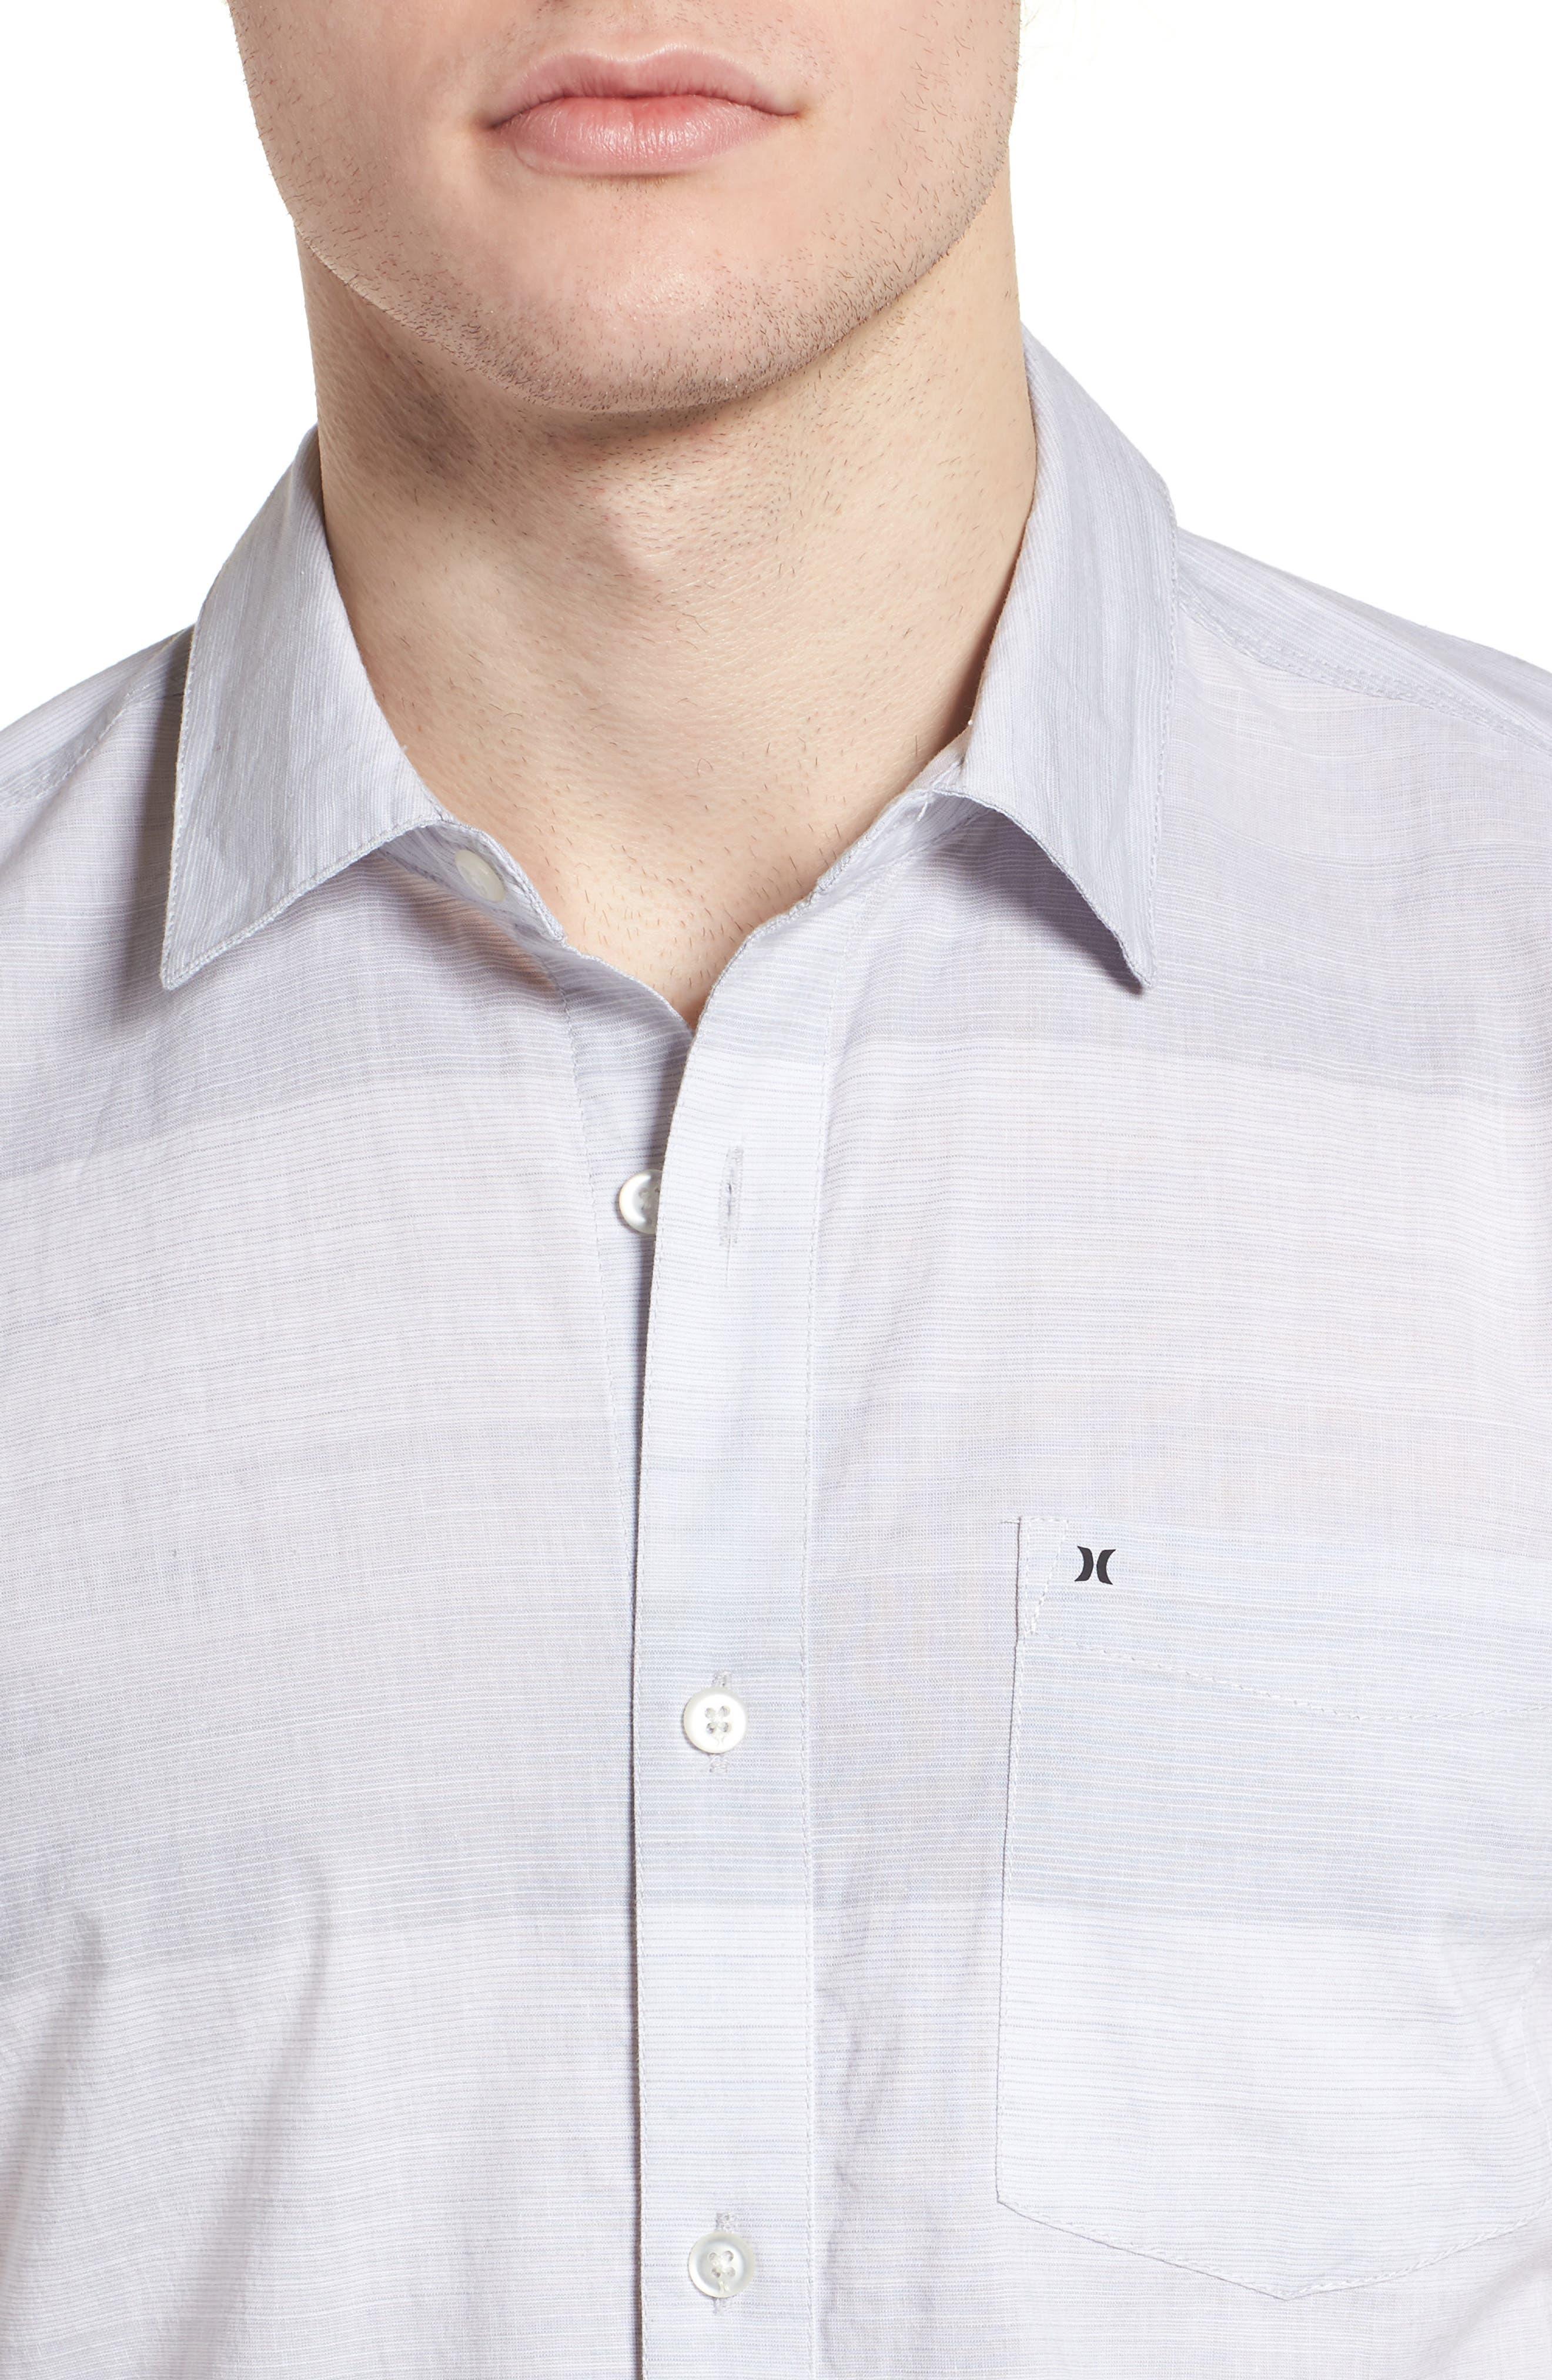 Morris Shirt,                             Alternate thumbnail 4, color,                             WOLF GREY